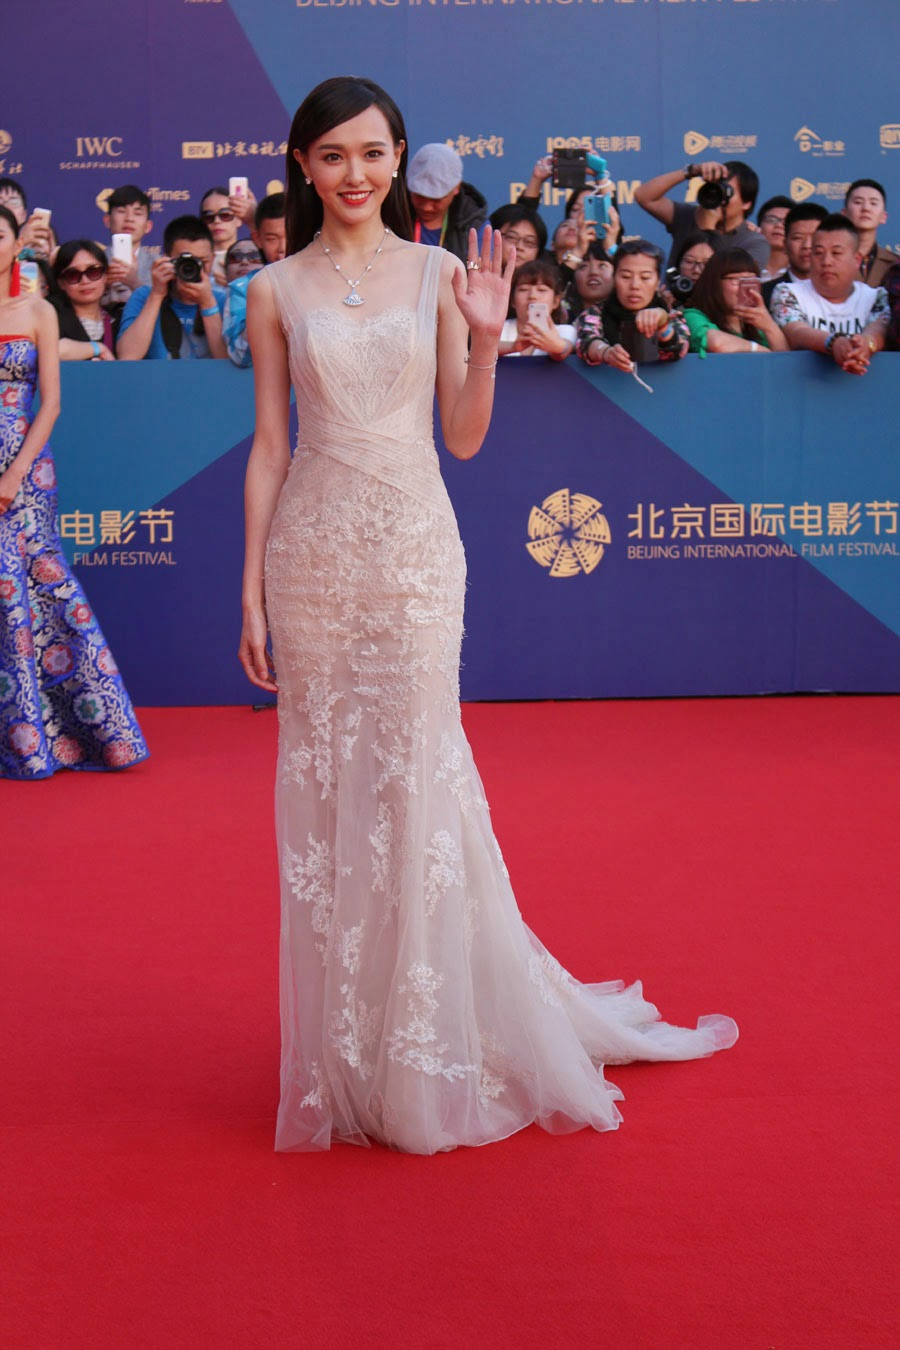 Beijing International Film Festival Beijing International Film